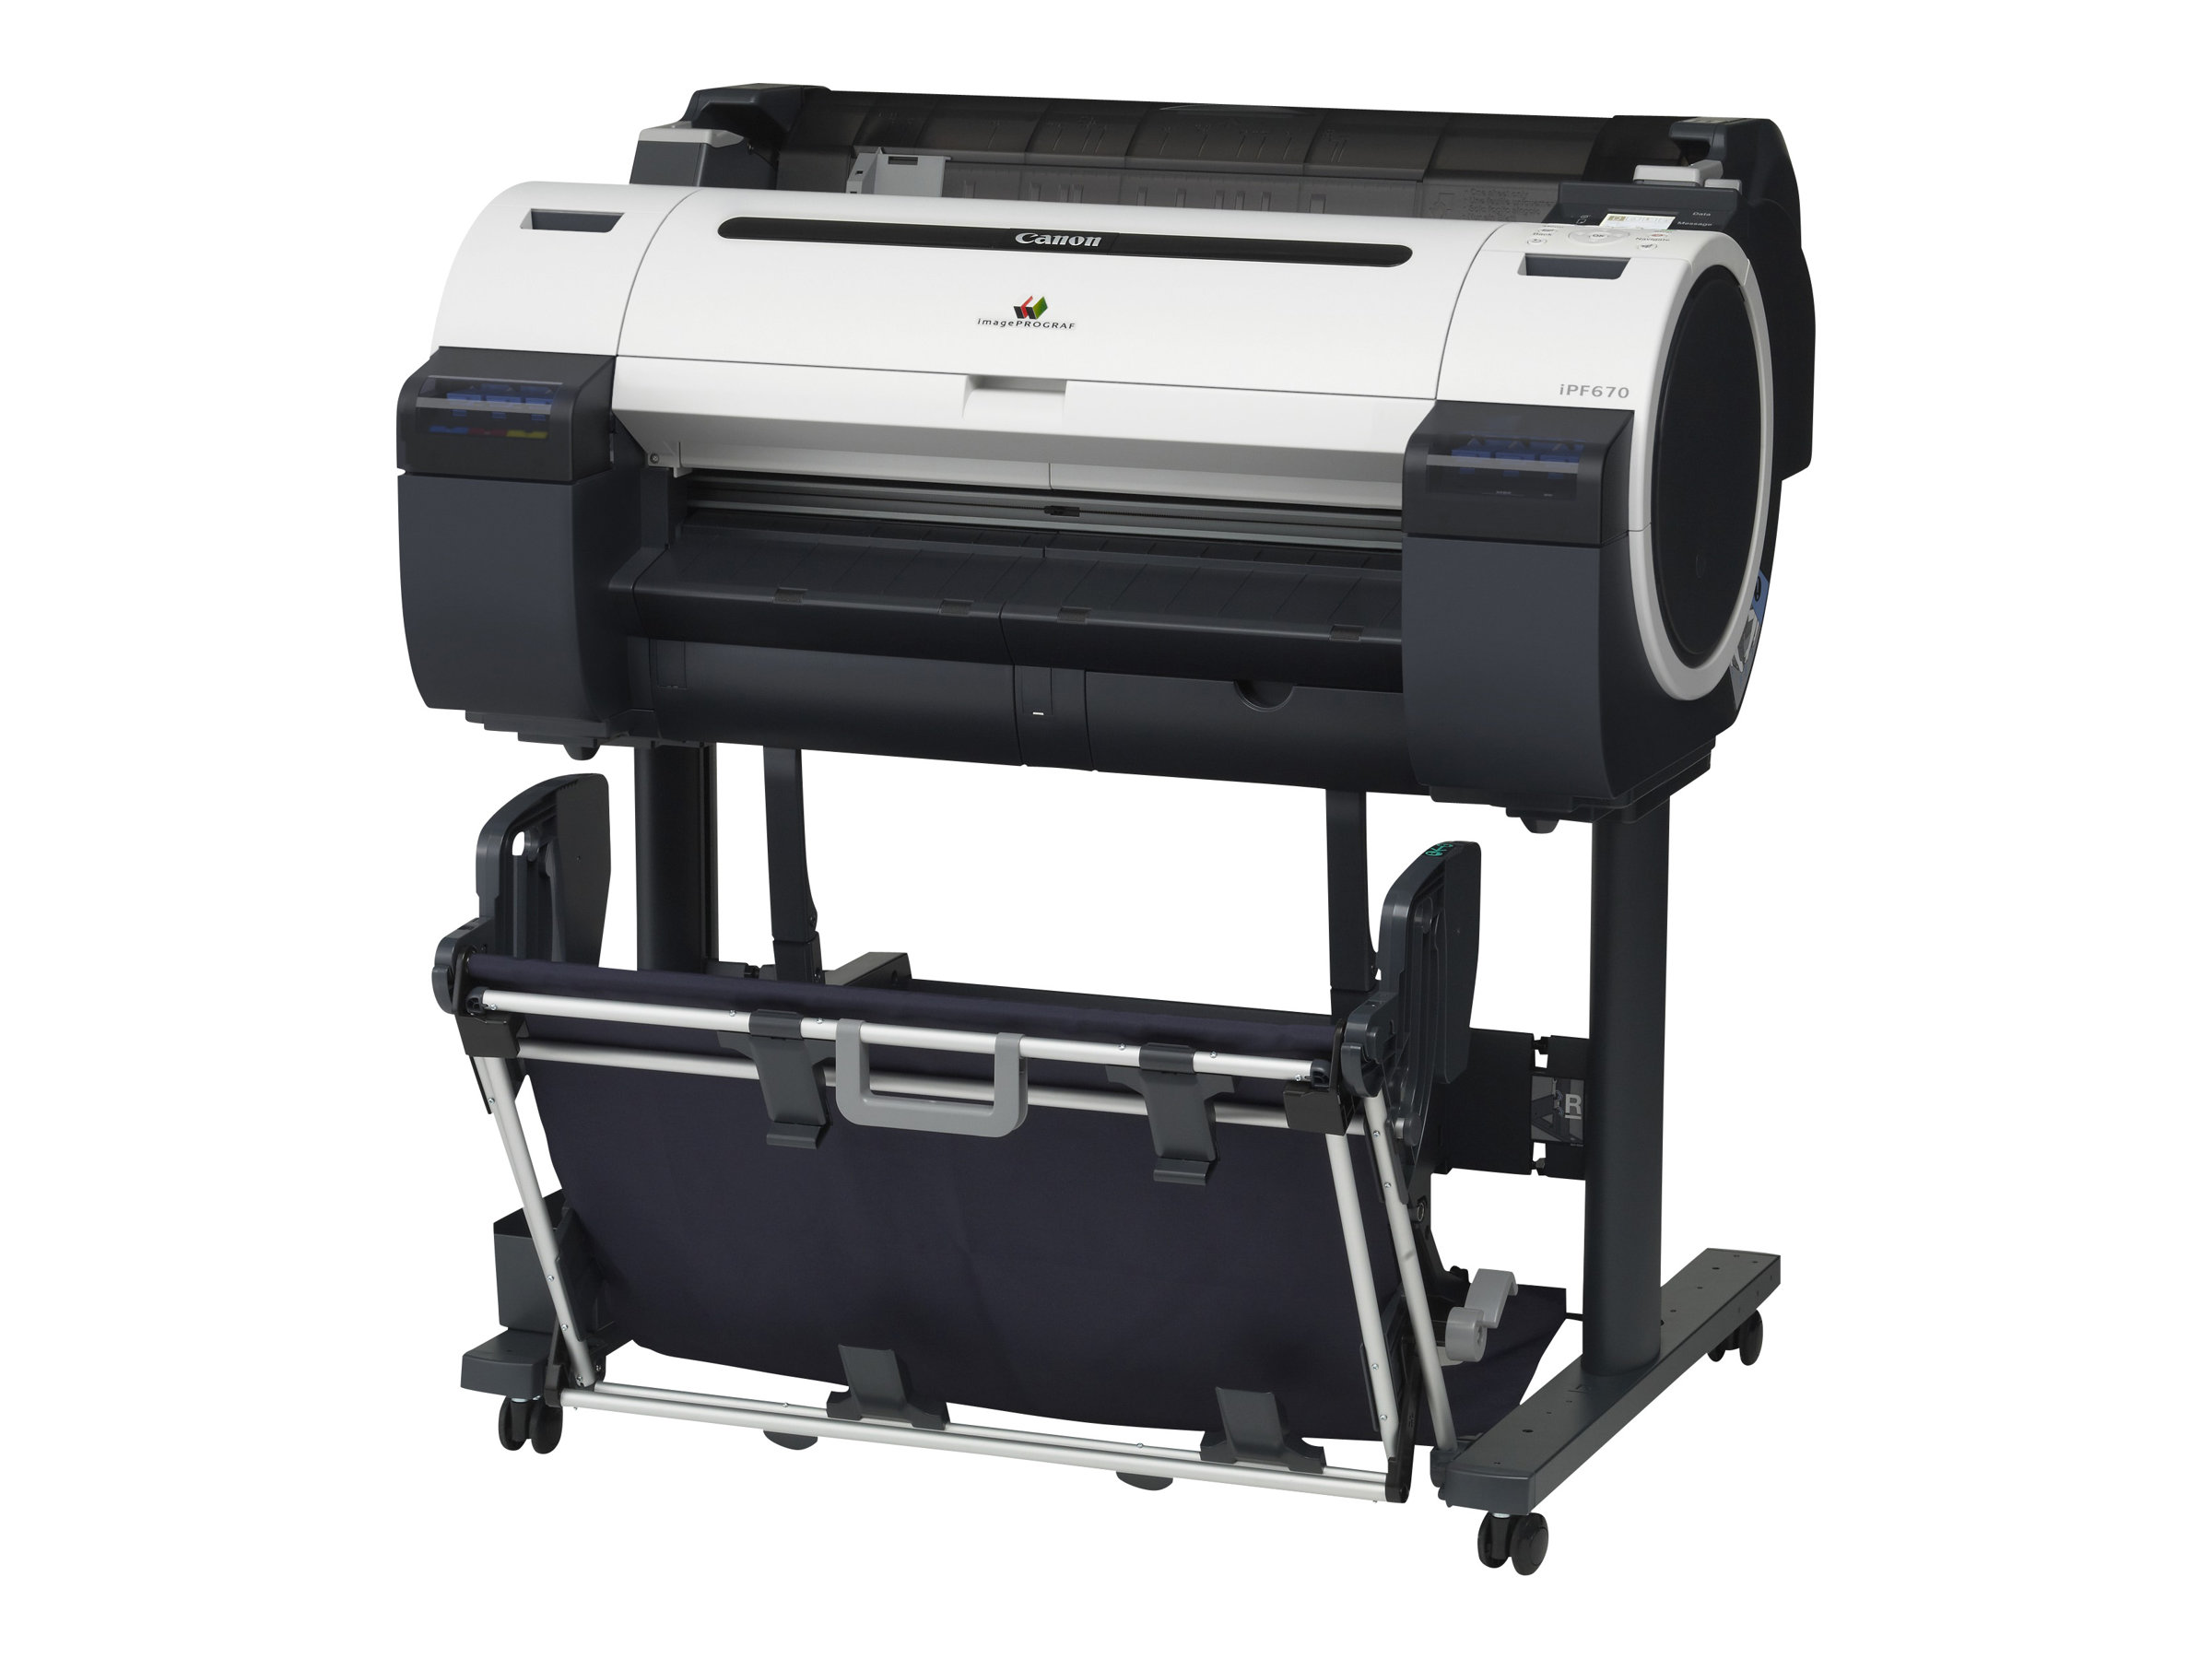 "Canon imagePROGRAF iPF670 - 610 mm (24"") Gro?formatdrucker"